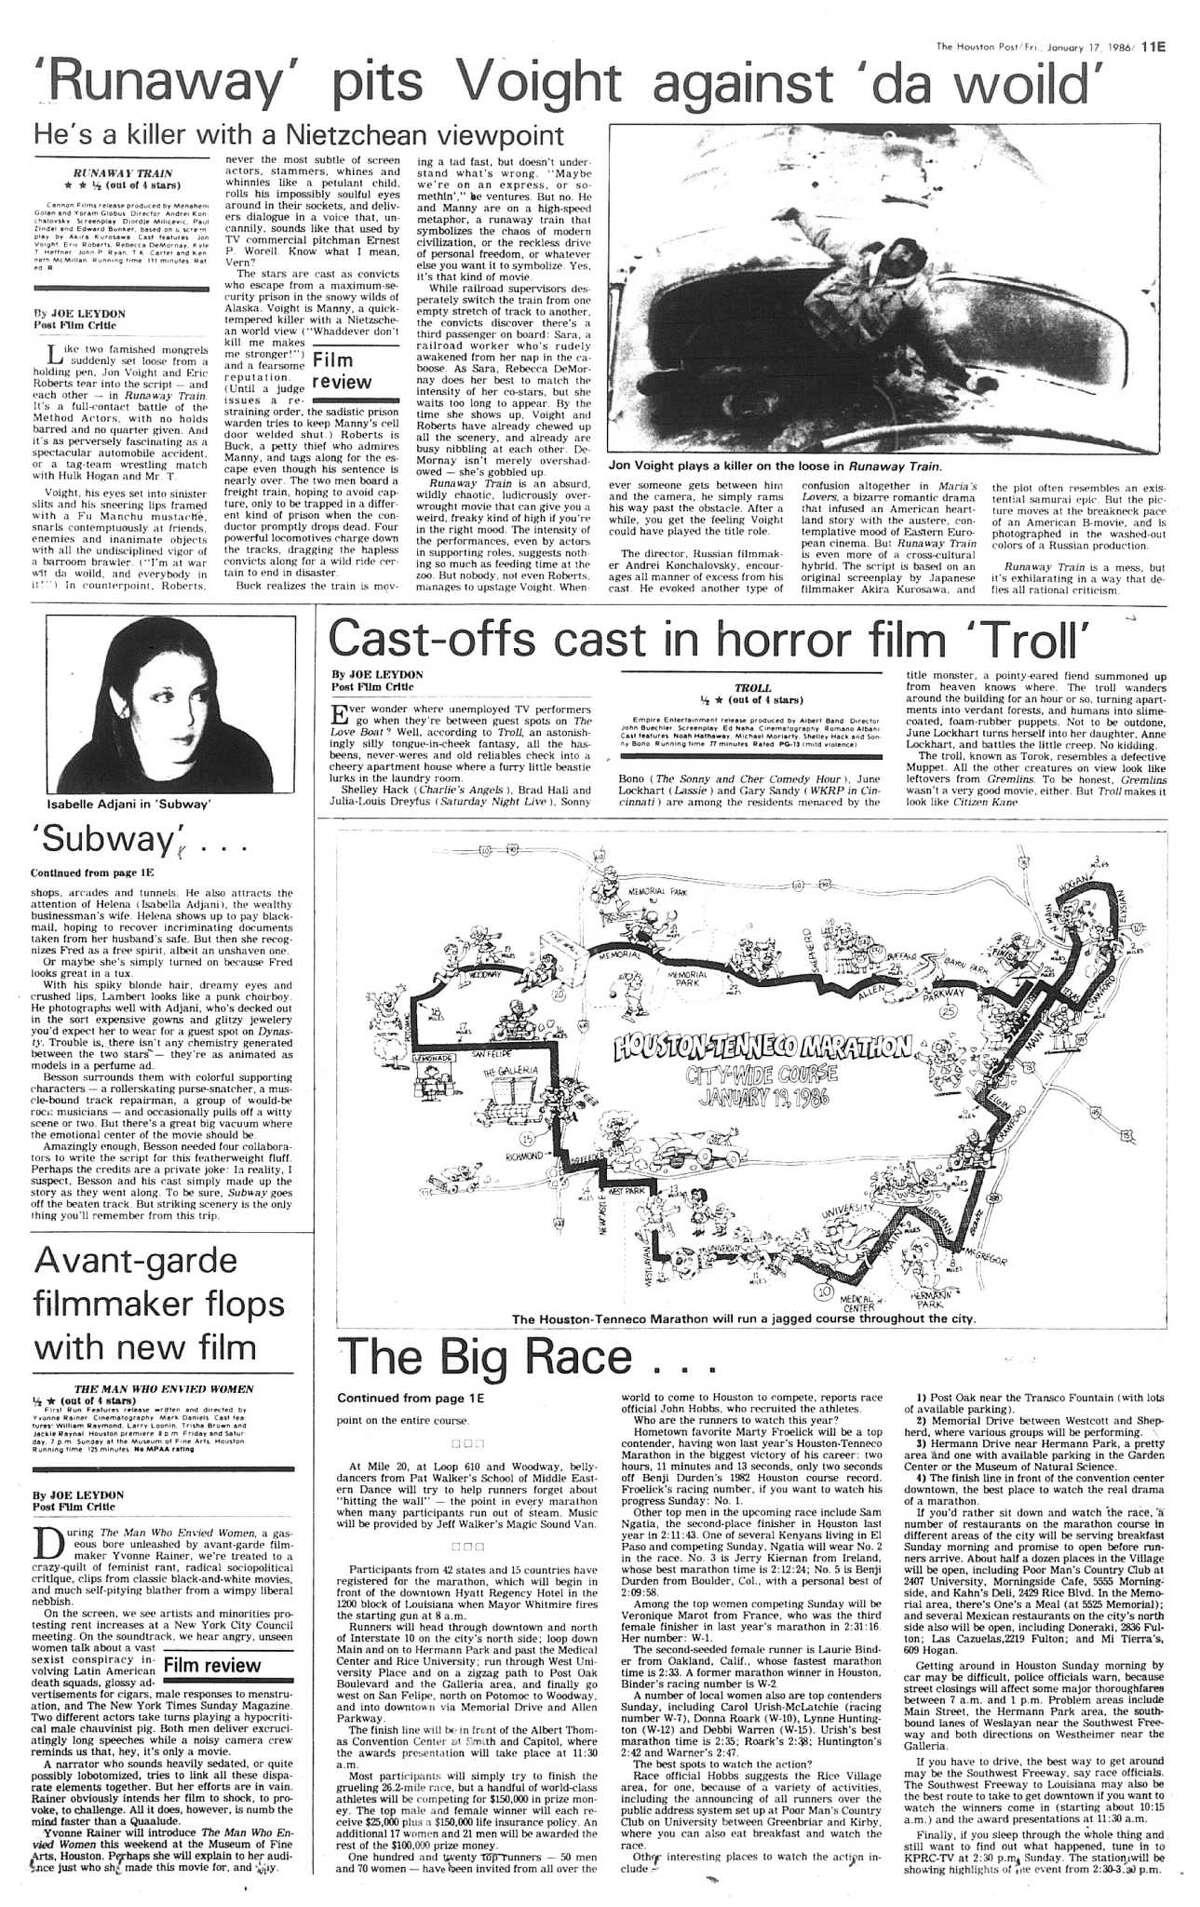 Houston Post inside page (HISTORIC) Â?- January 17, 1986 - section E, page 17. The Big Race ... The Houston-Tenneco Marathon